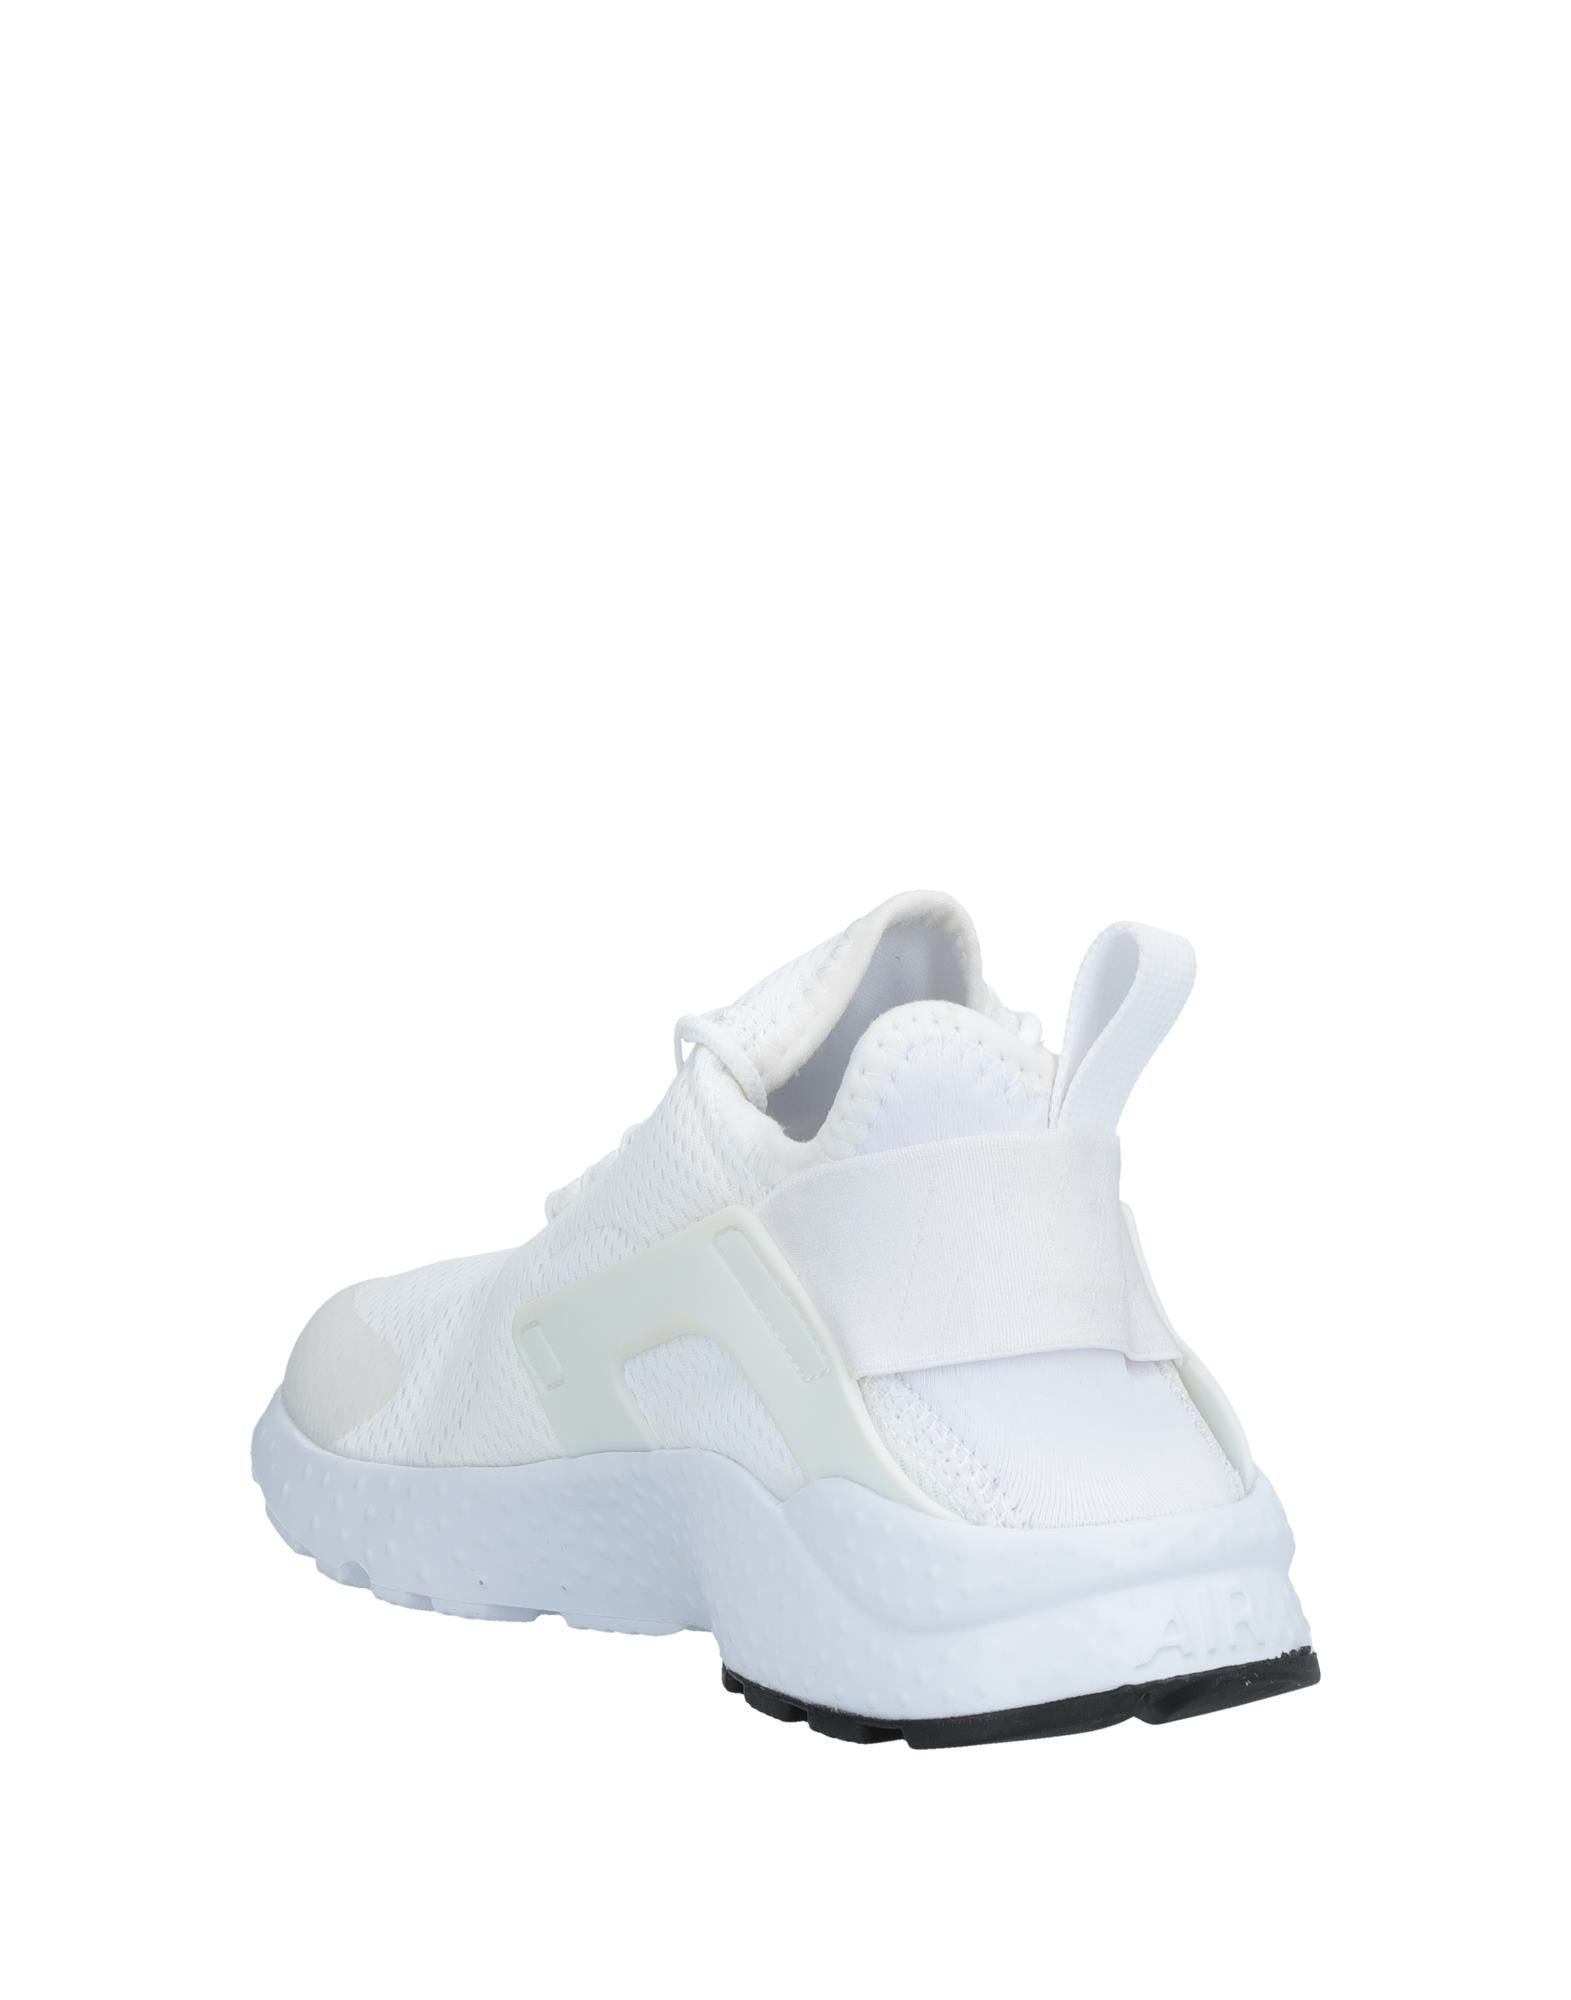 Moda Moda Moda Sneakers Nike Donna - 11529877KH d1f727